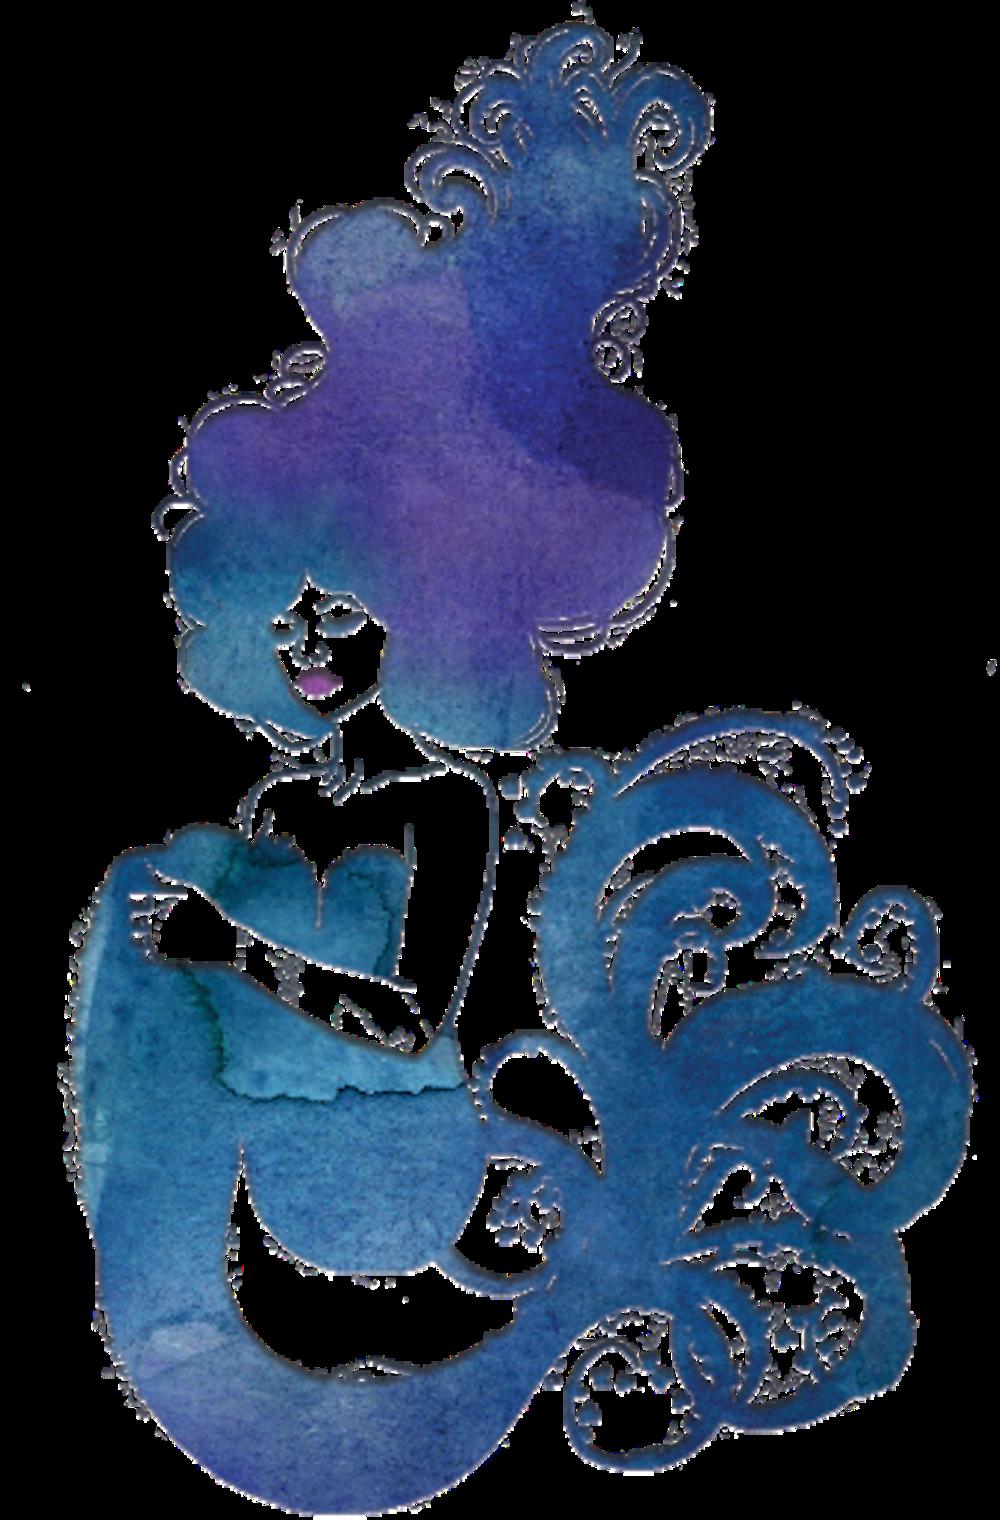 Meditation clipart spiritual wellness. Madeline rinehart also known